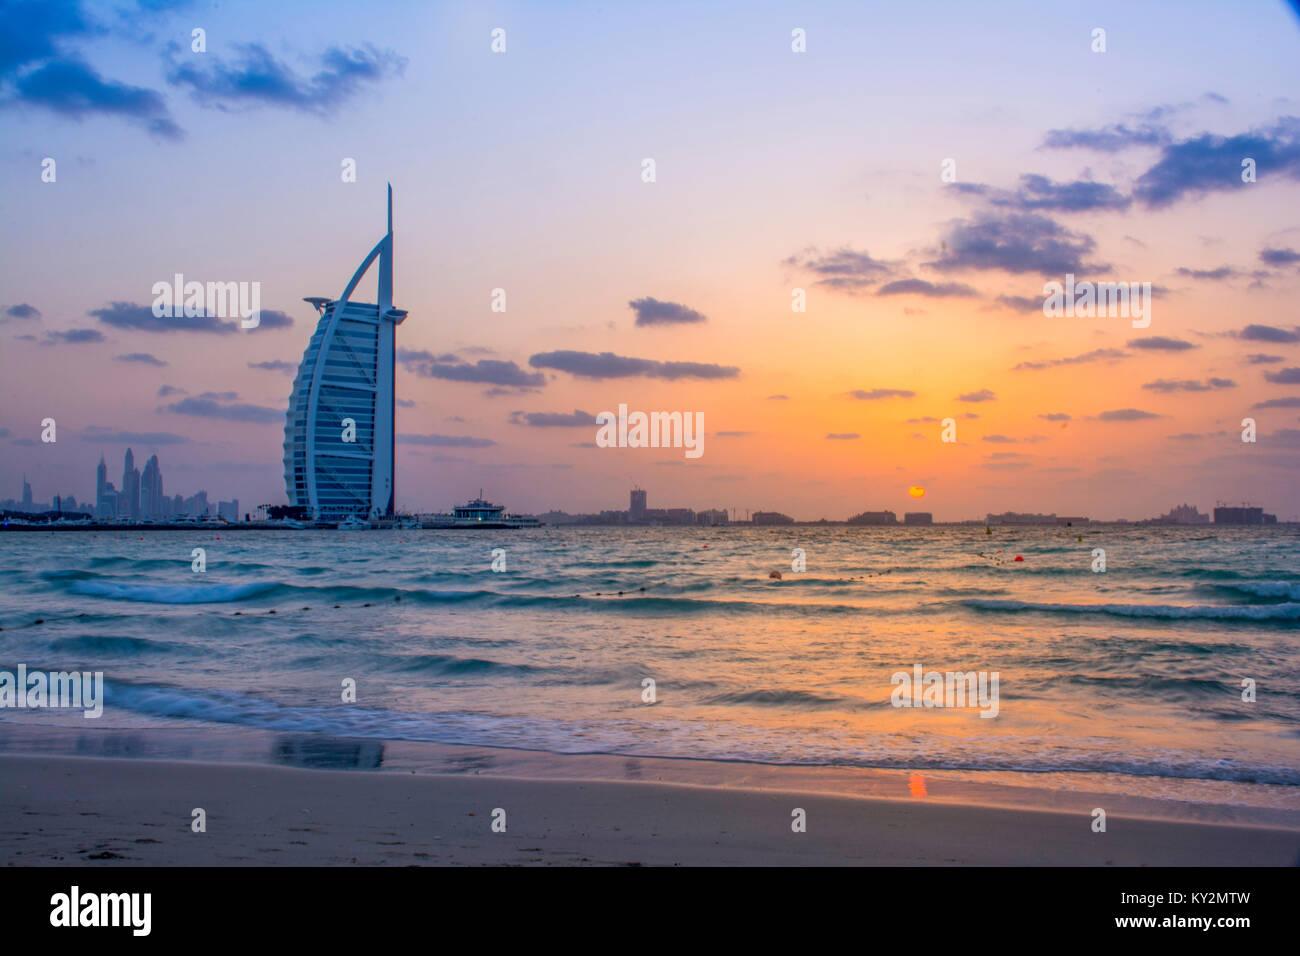 El Burj Al Arab Sunset - Noche dispararon desde Umm Suqeim beach - Dubai Foto de stock